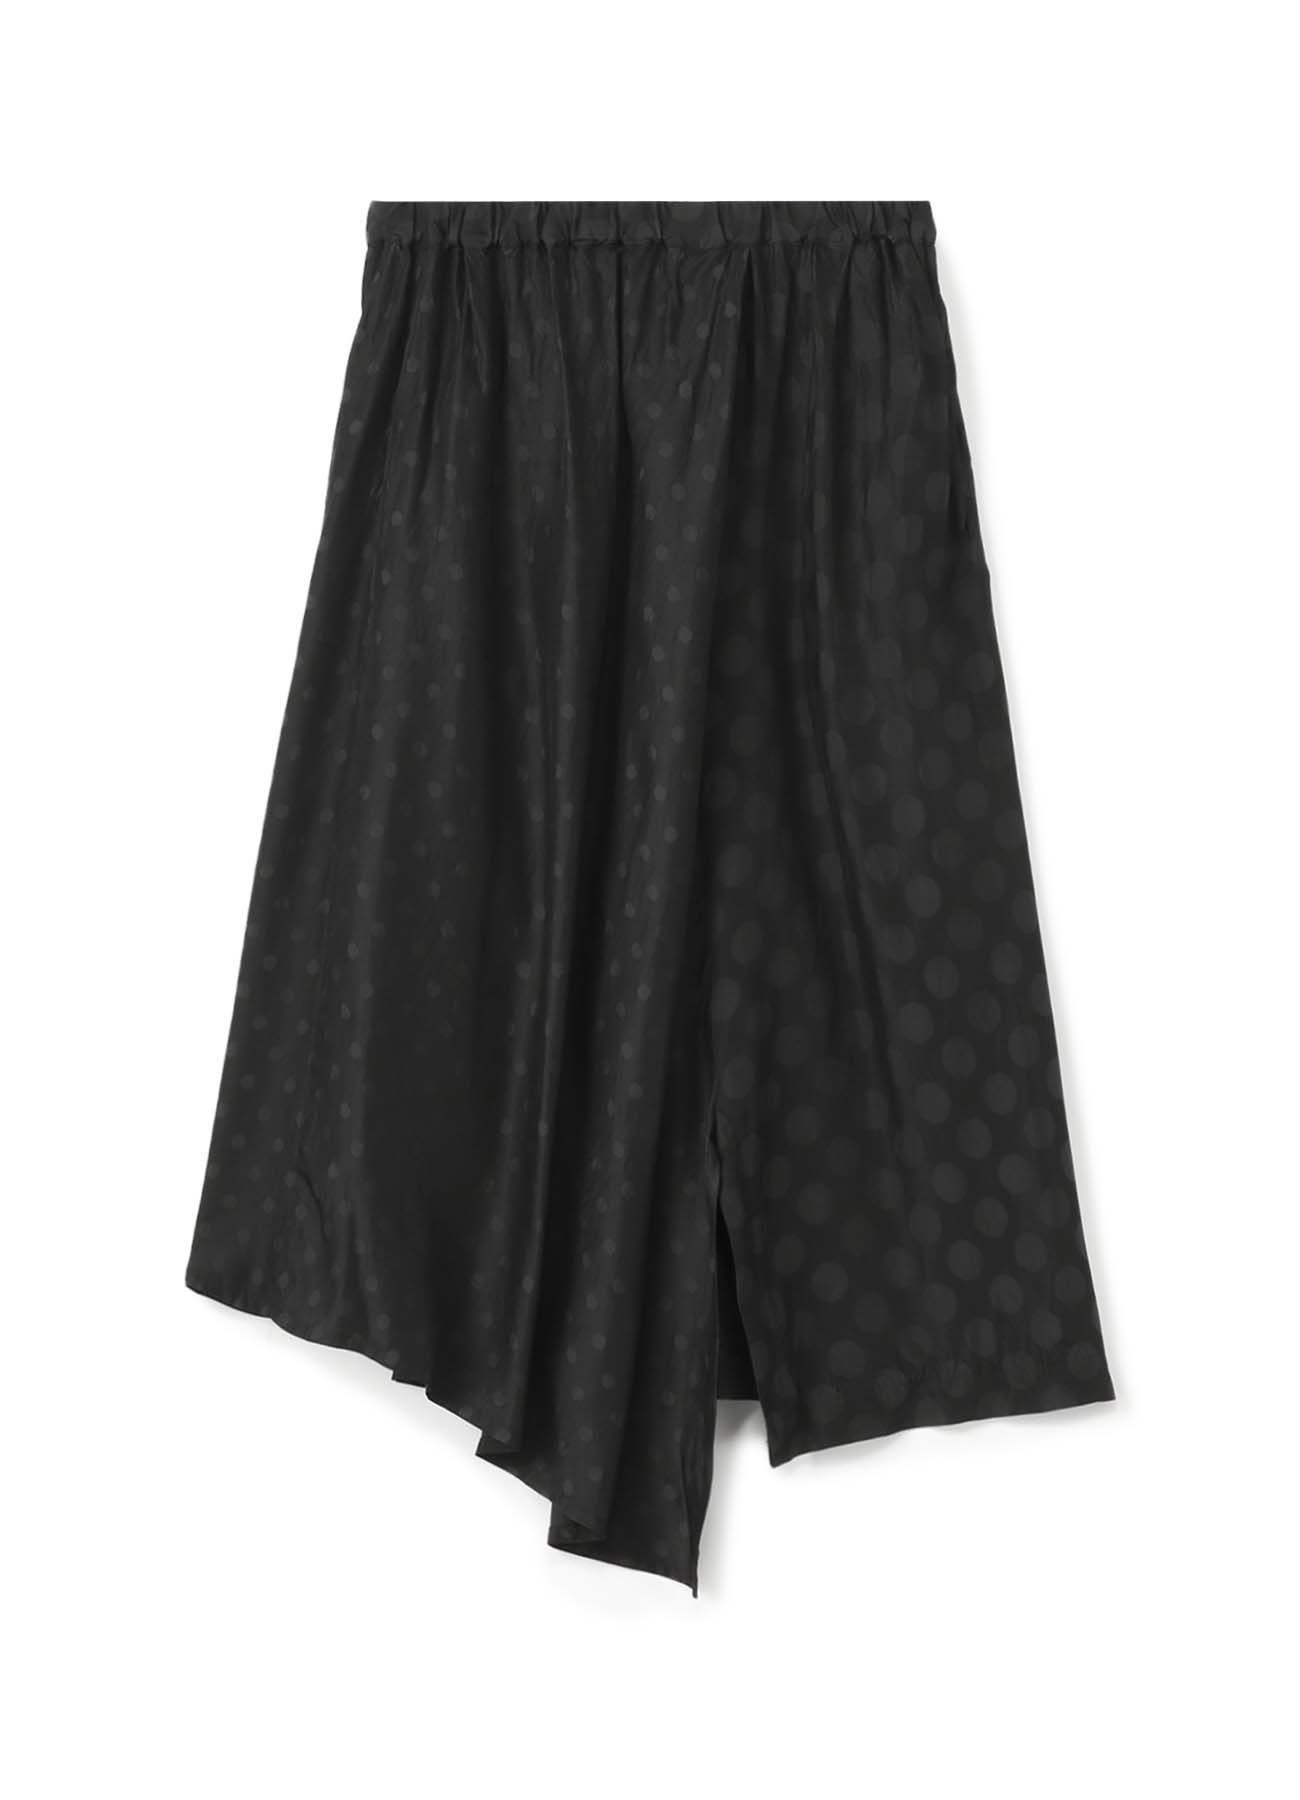 Cupra染提花圆点三角形喇叭半身裙